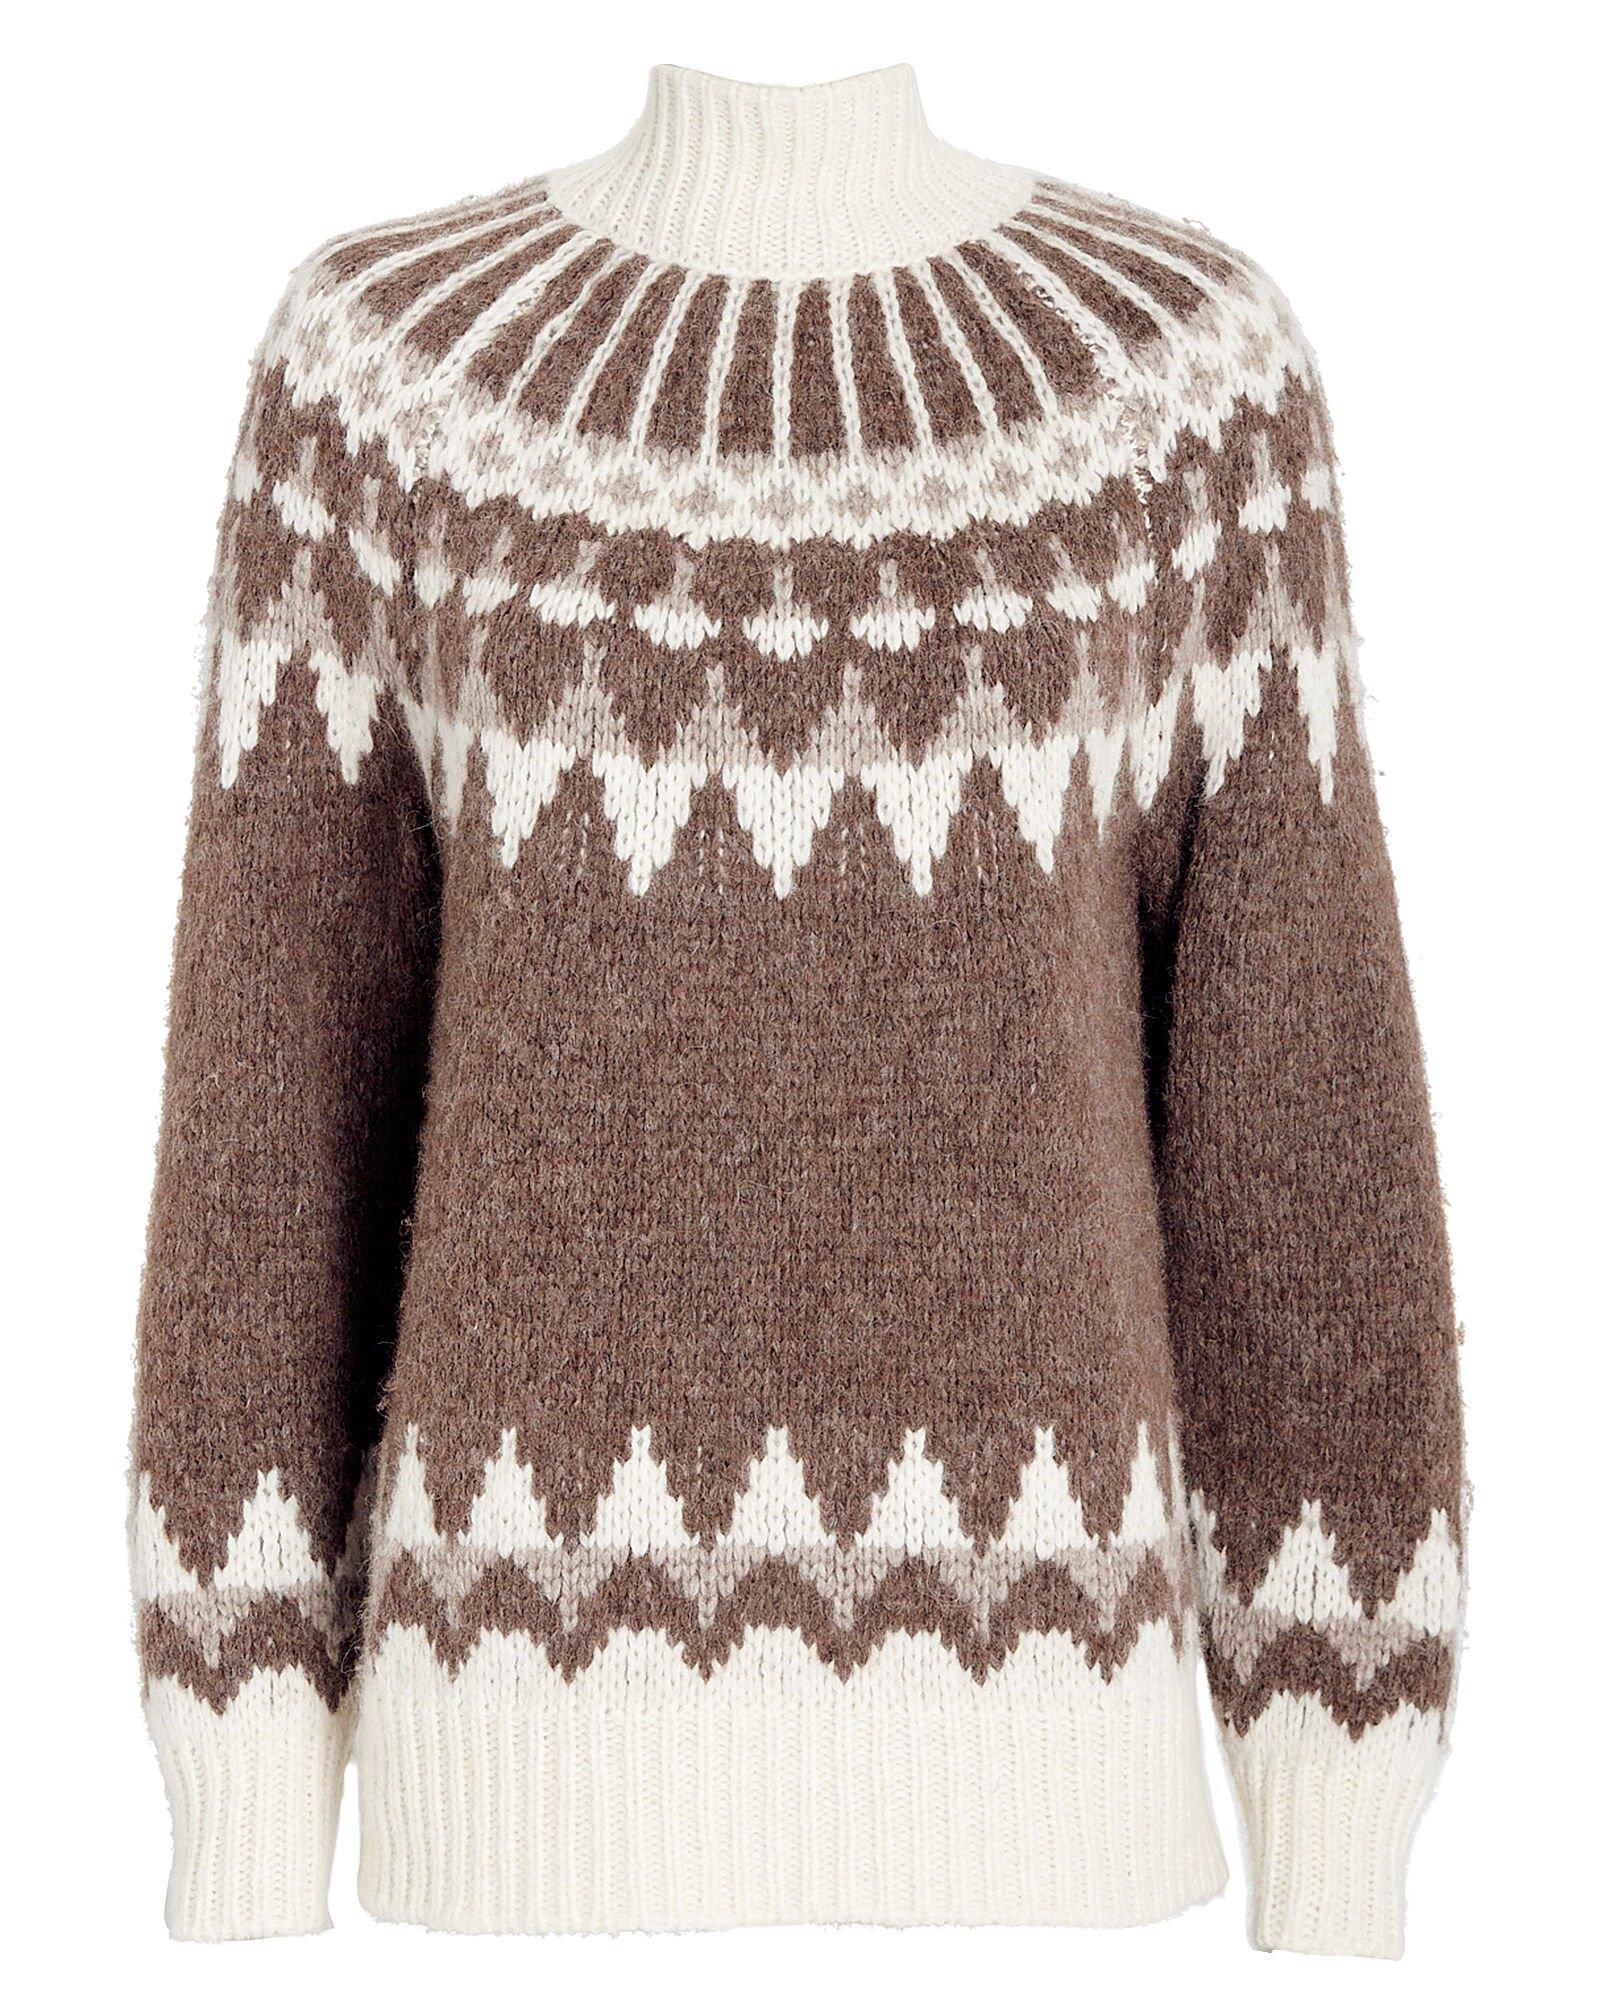 Fair Isle Intarsia Turtleneck Sweater